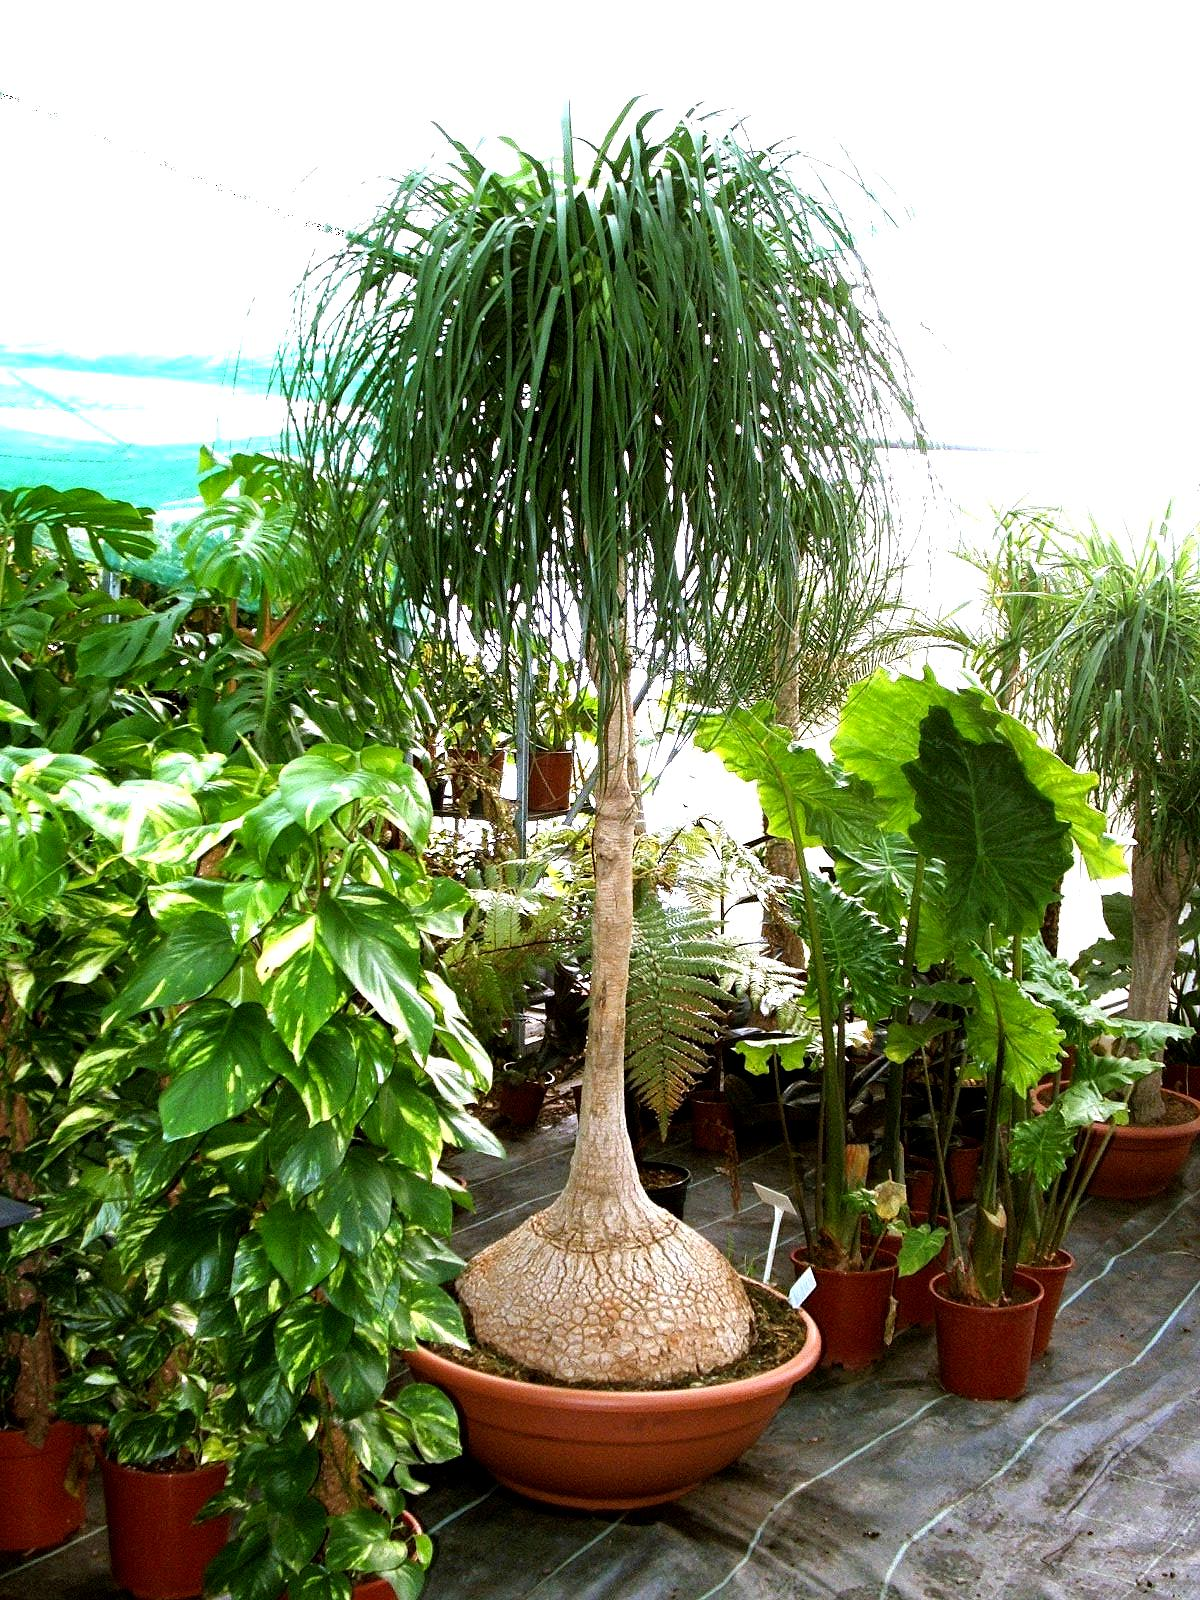 http://nargil.ir/plant/images/pic/43/Beaucarnea%20Recurvata%2014.JPG